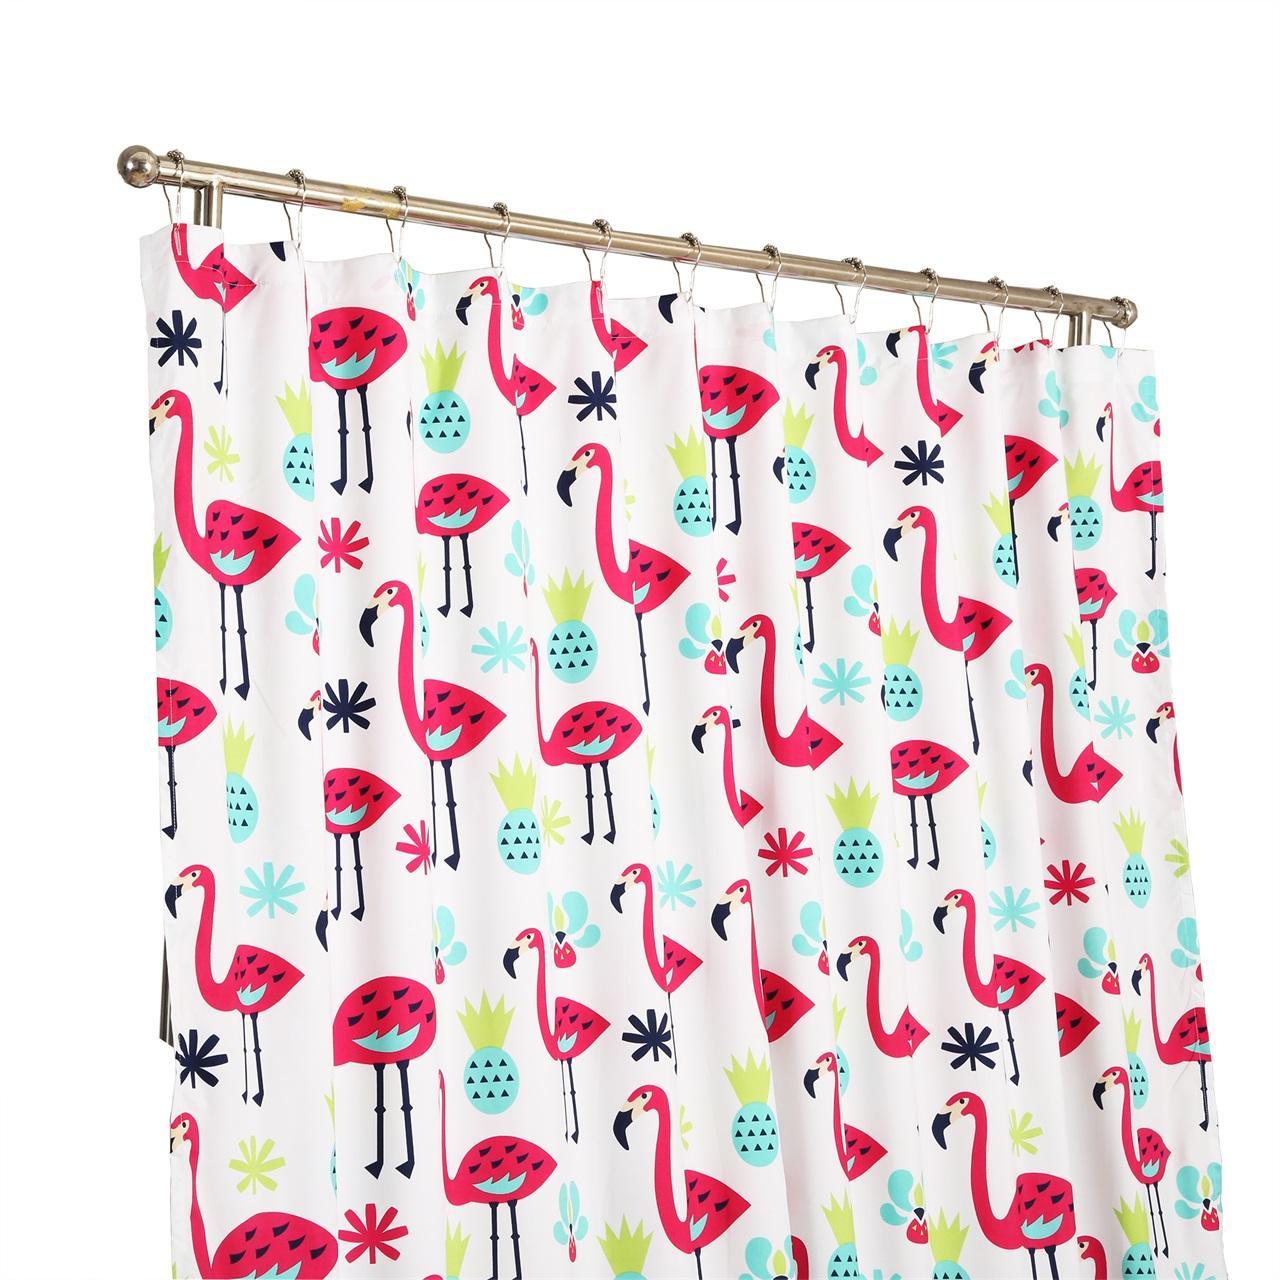 Sea Kitchen Curtains Amazon: Amazon.com: Affluence Home Fashions Fancy Flamingo Shower